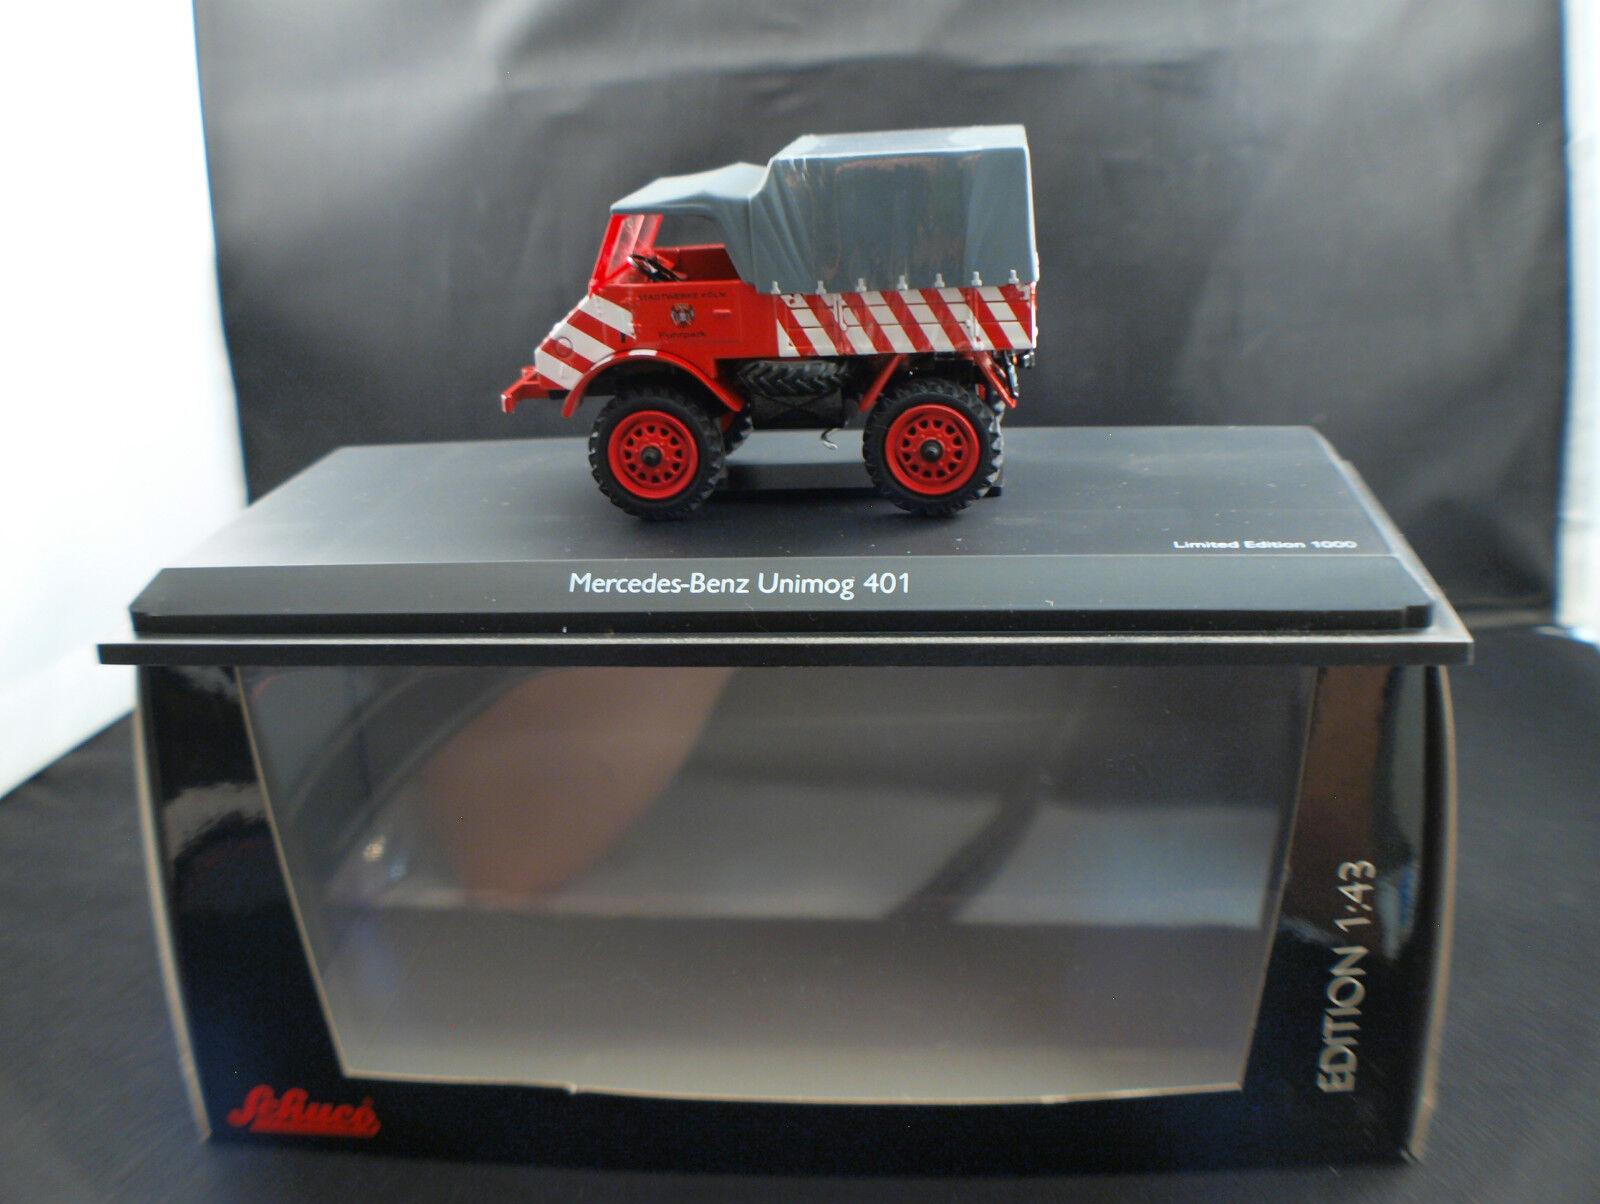 Schuco 03109 camion Pompiers Mercedes-Benz Unimog 401 Stadtwerke Köln 1 43 mint